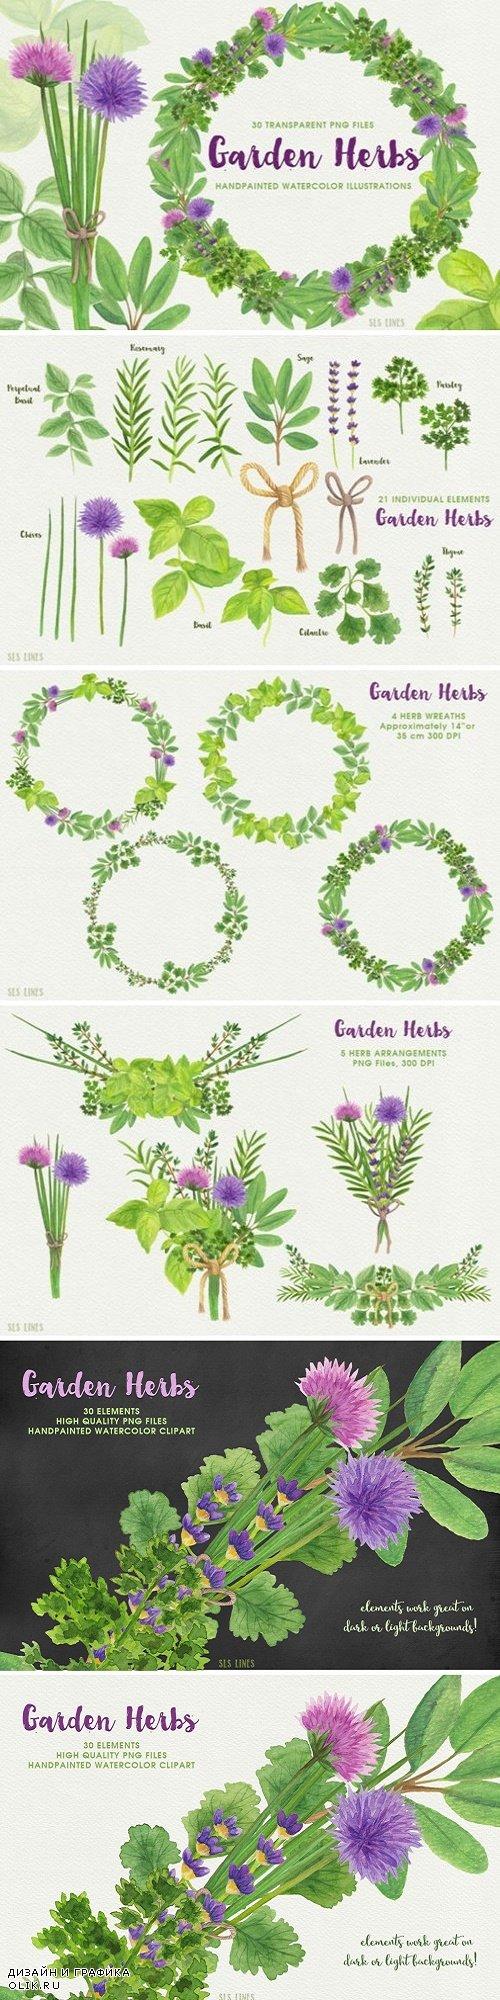 Herb Garden Watercolor Illustrations - 1552811